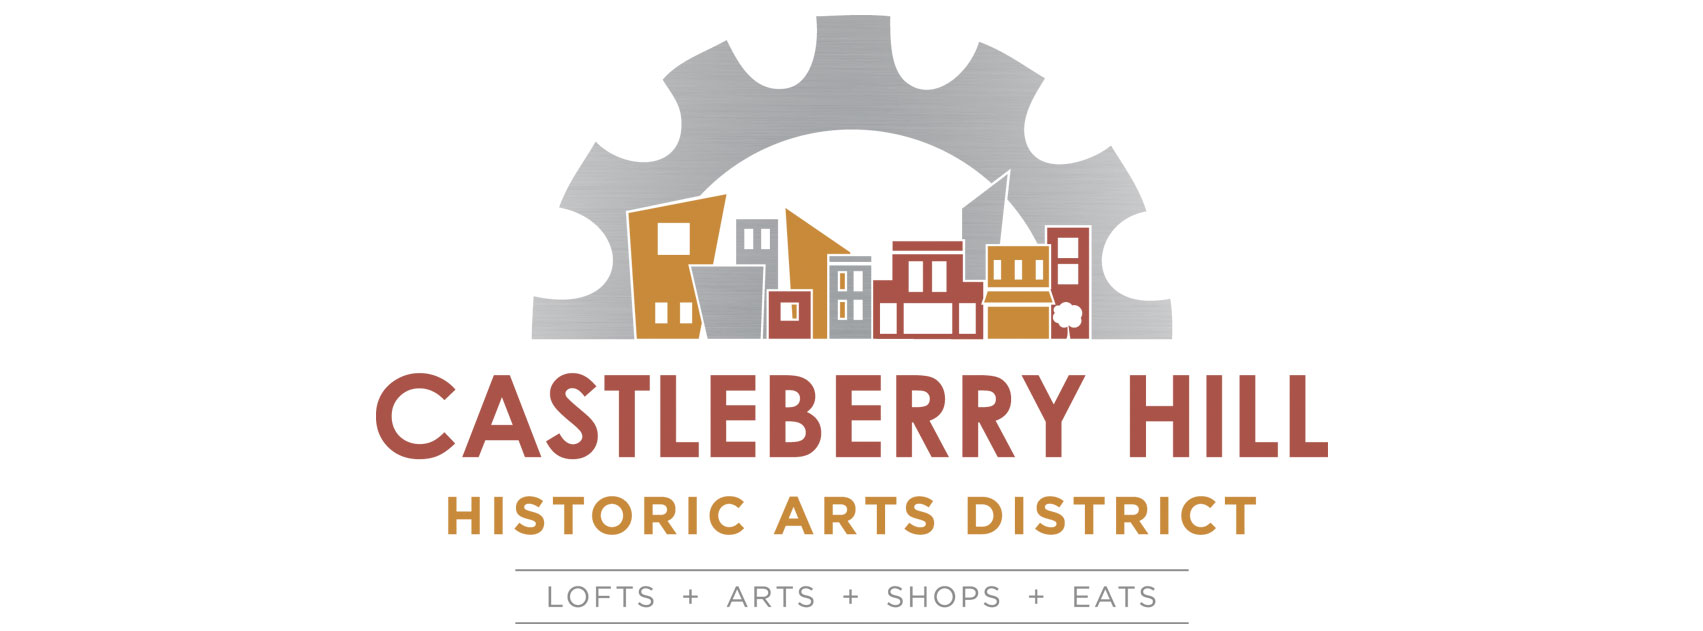 Castleberry Hill